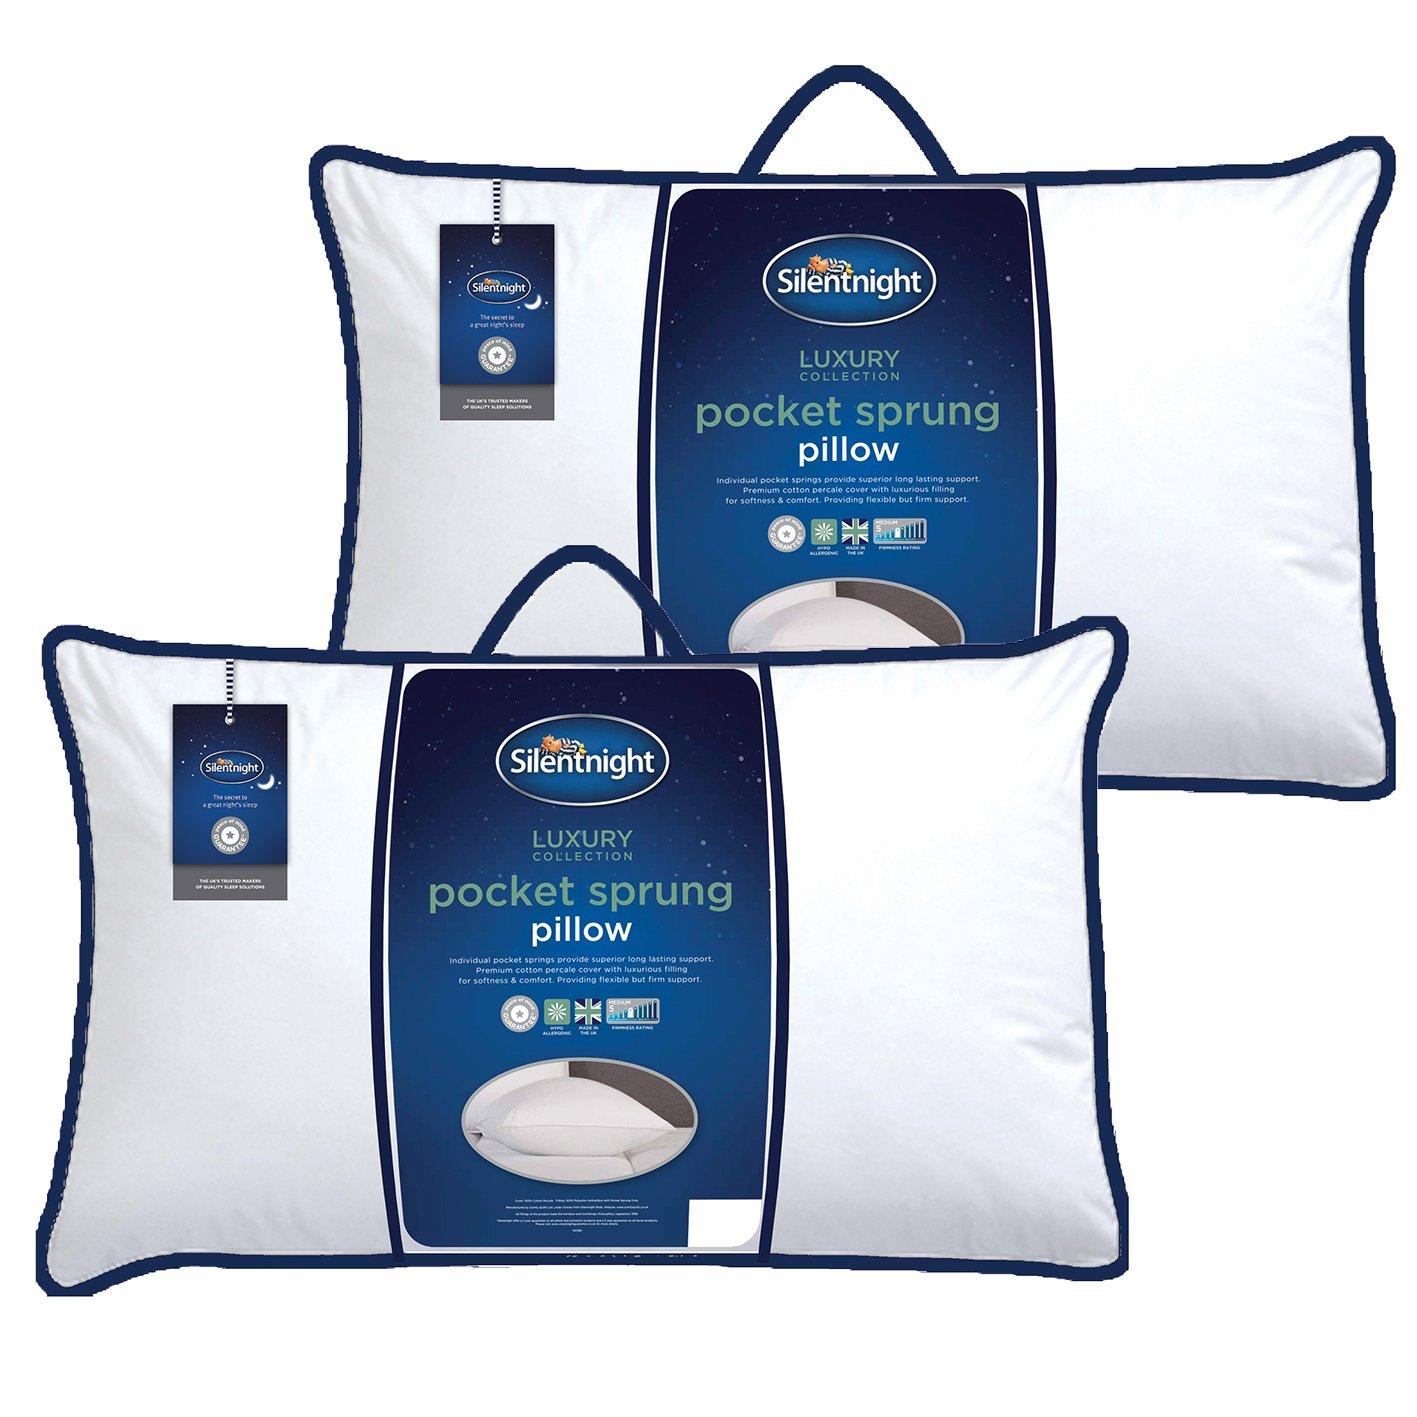 Silentnight Luxury Pocket Sprung Pillow - Pack of 2